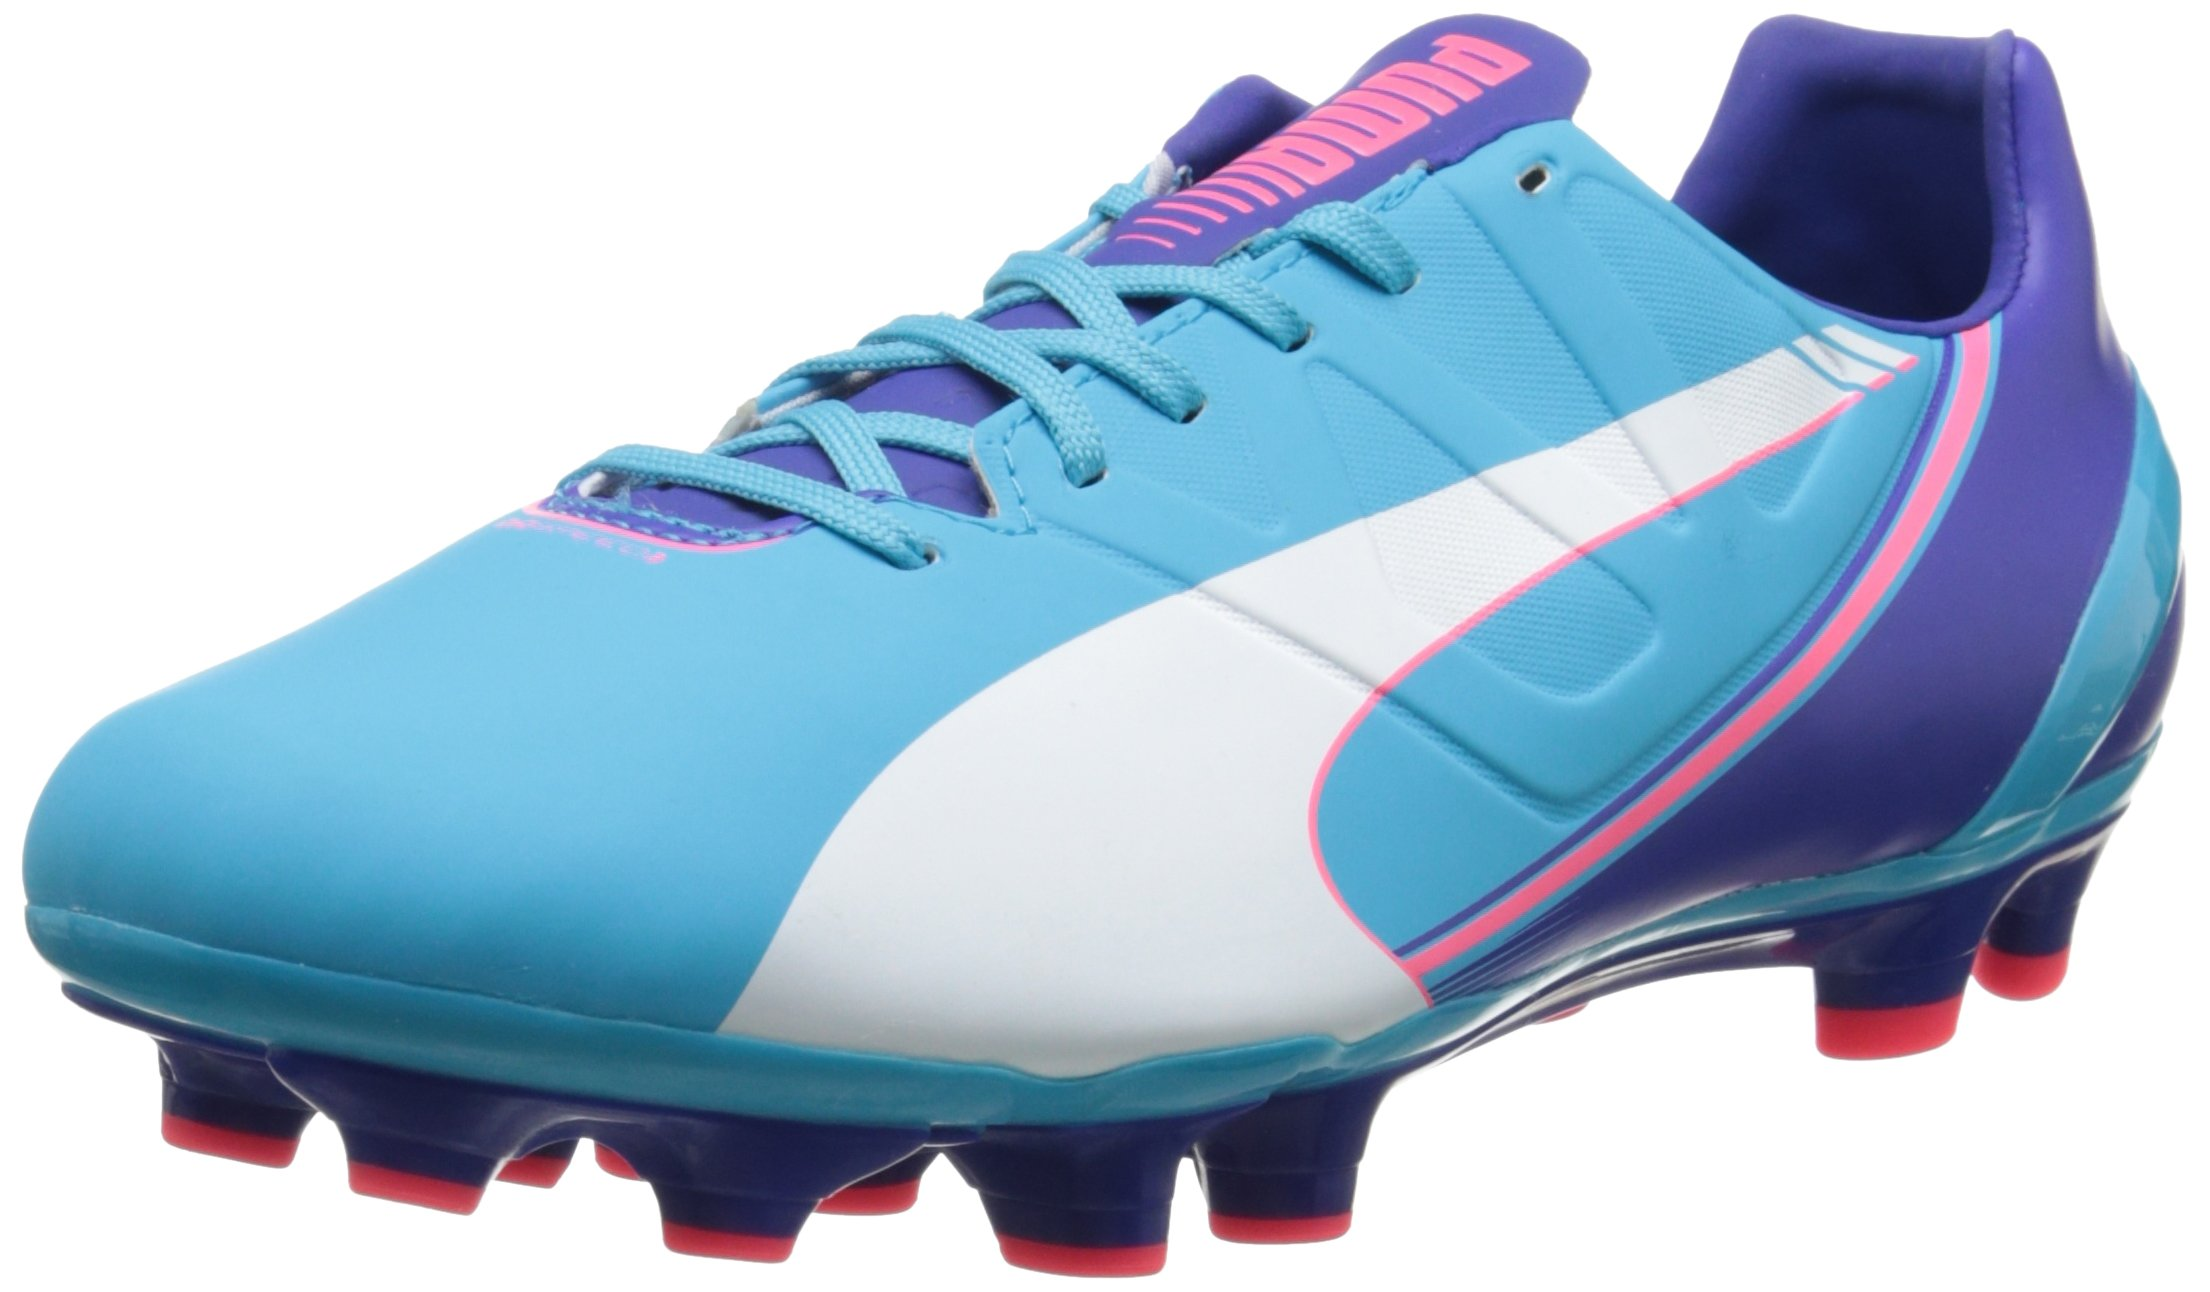 PUMA Women's Evospeed 3.FG Soccer Shoe, Blue Atoll/White/Clematis Blue/Bright Plasma, 7.5 B US